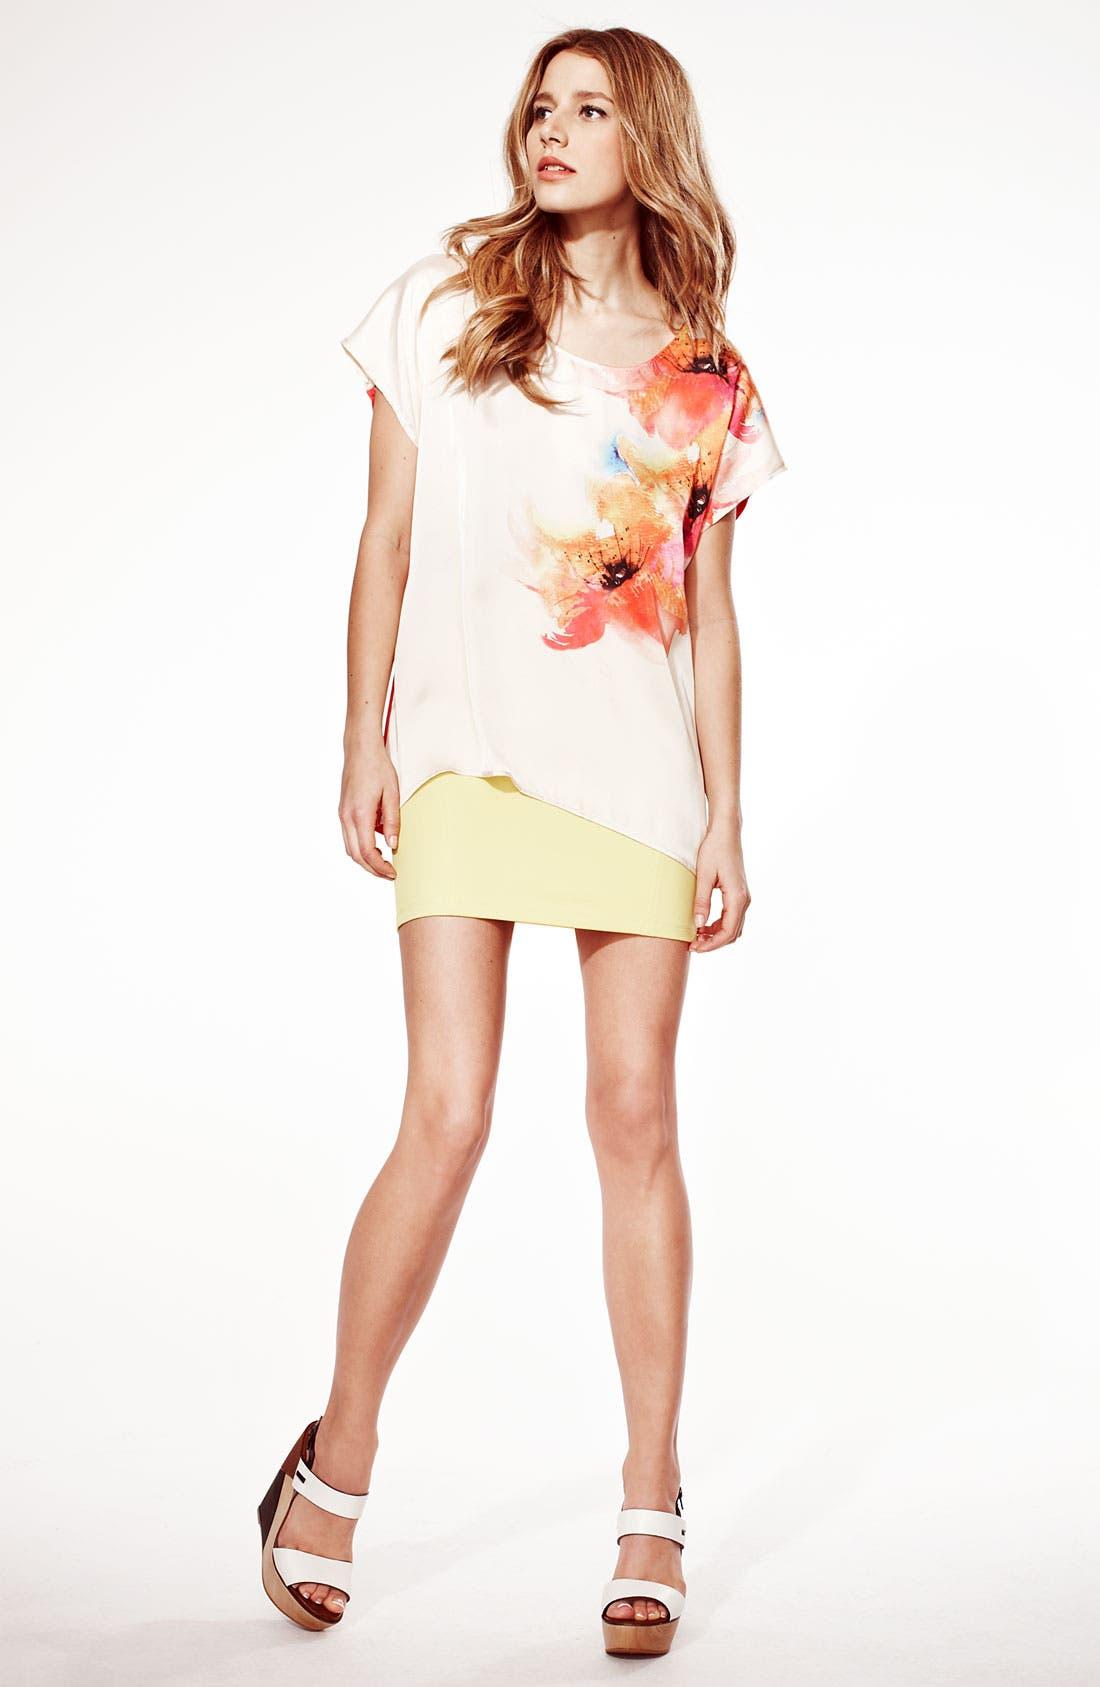 Main Image - Bellatrix Top & LMK Miniskirt